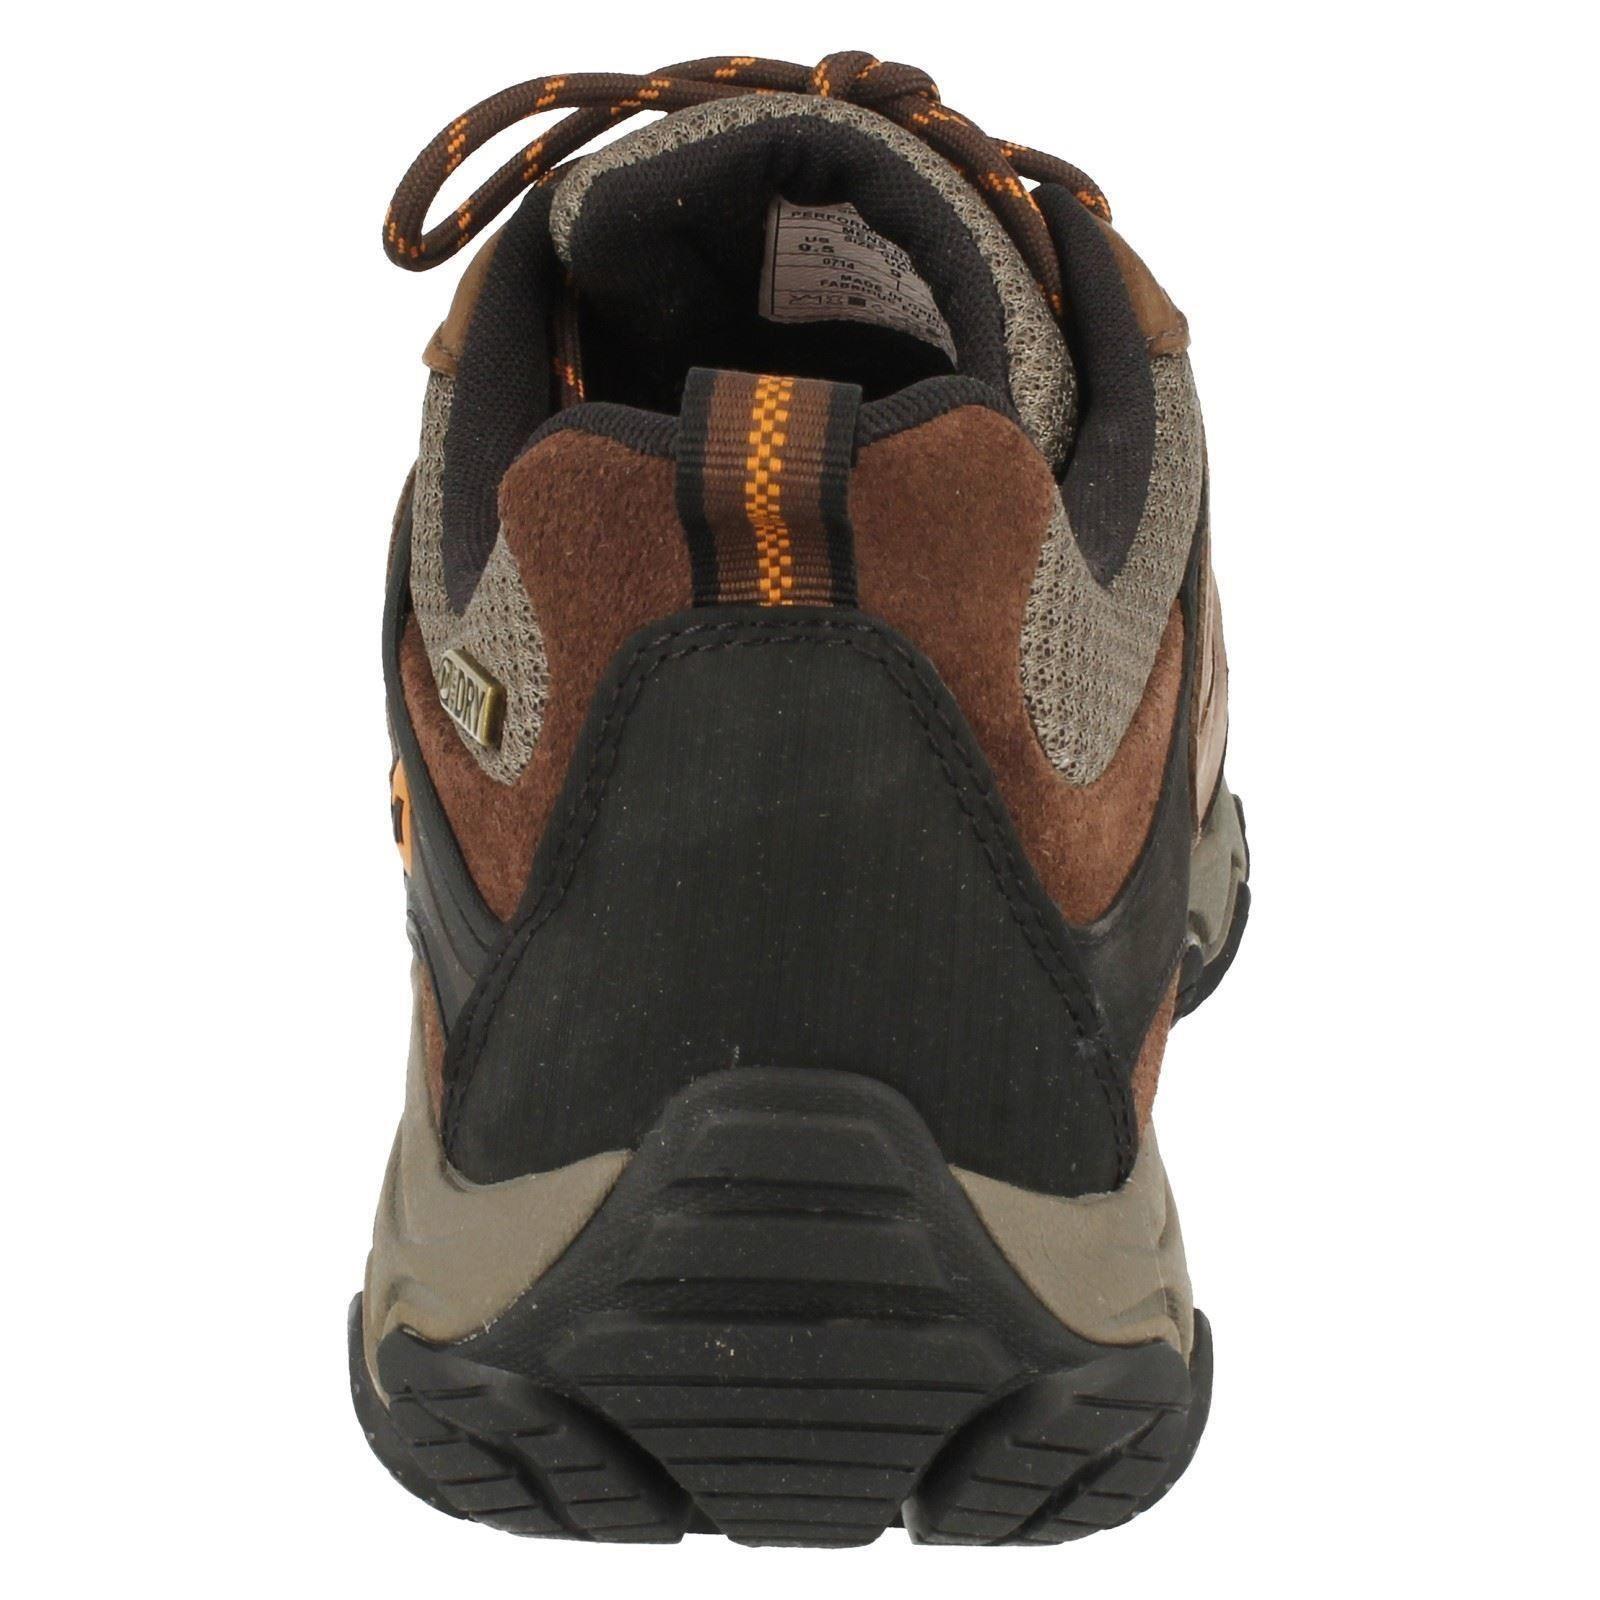 Hombre Merrell Pulsate Waterproof Waterproof Waterproof J24397 Walking Zapatos 566e1c